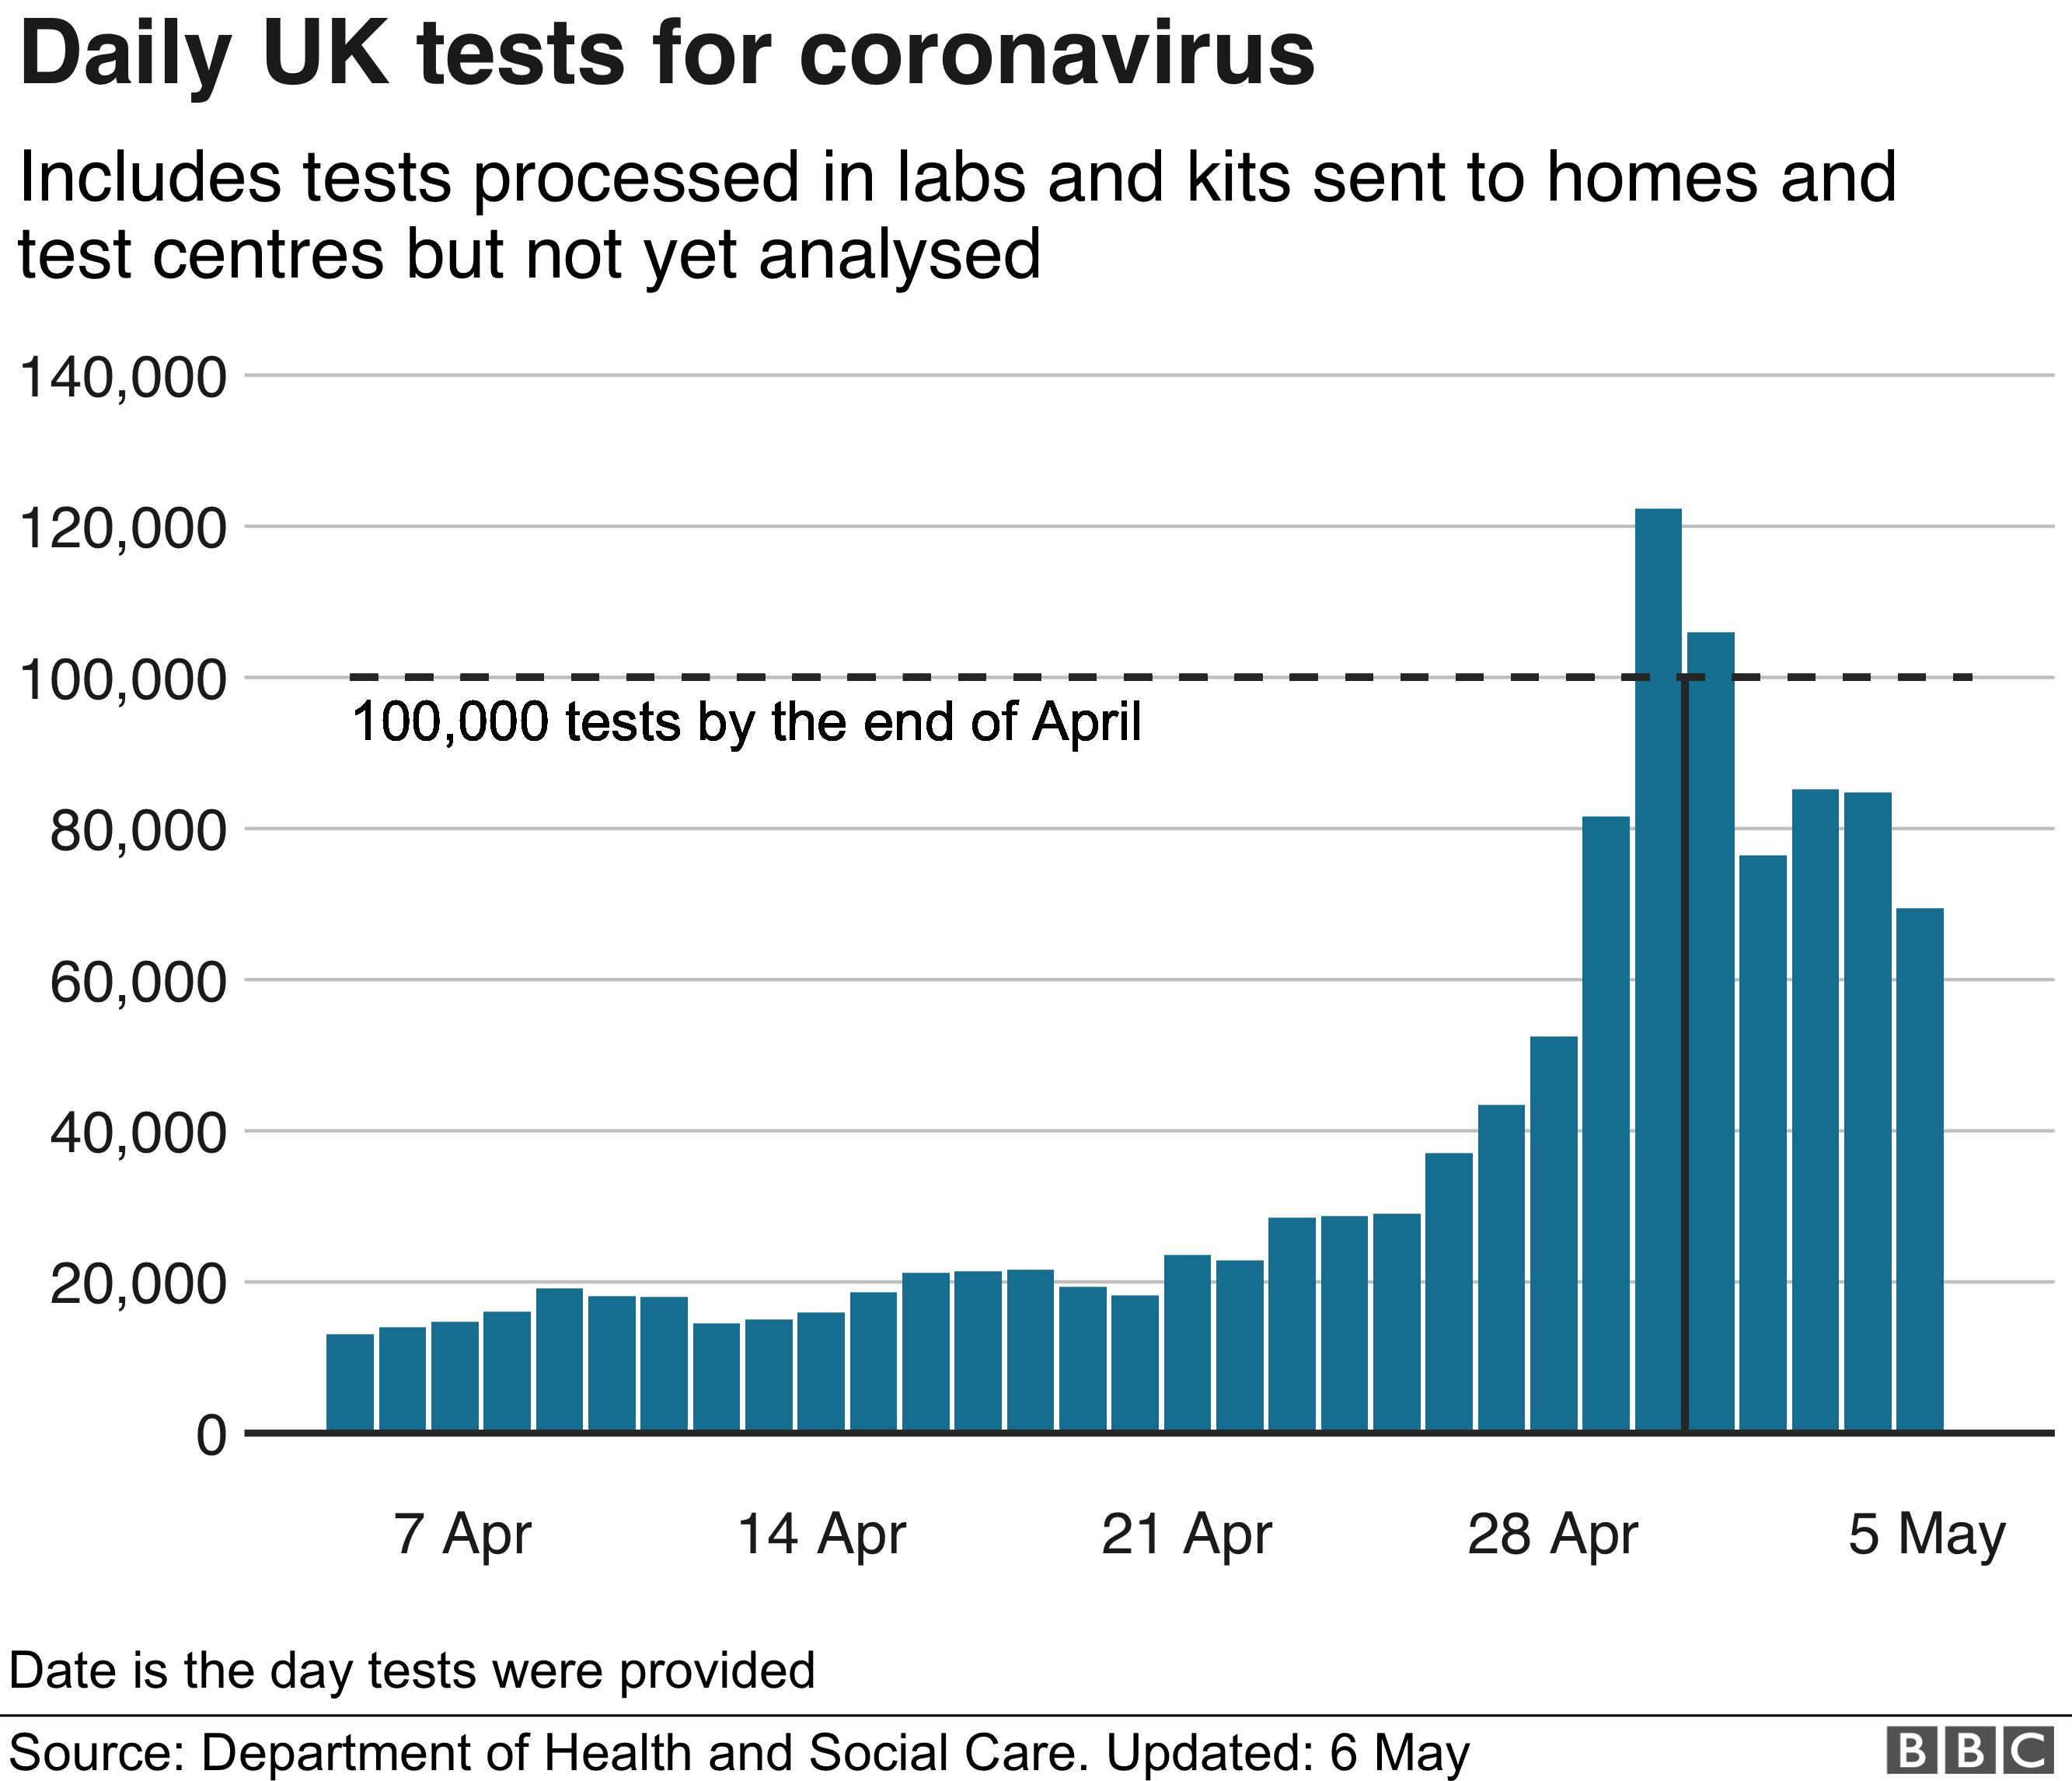 Graph showing daily UK tests for coronavirus